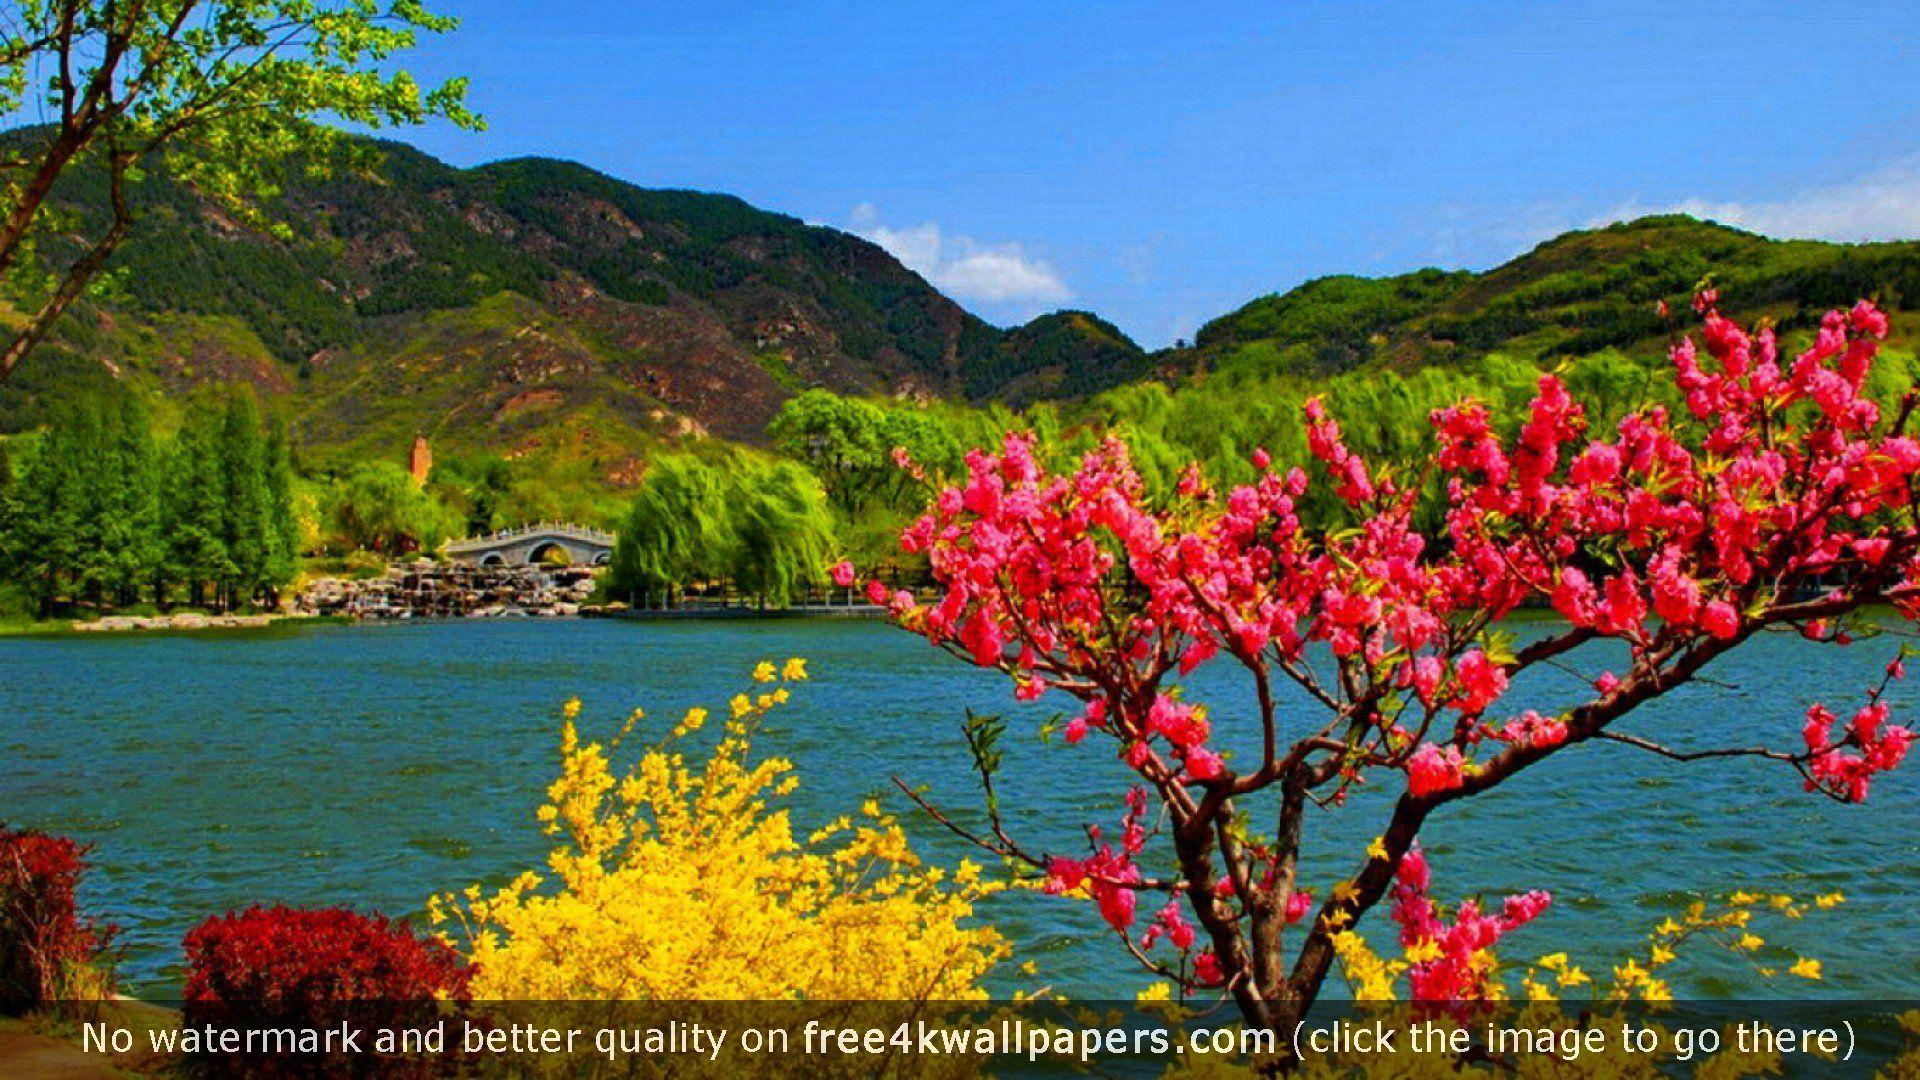 Hd wallpaper kashmir - Kashmir Hd Hd Wallpaper